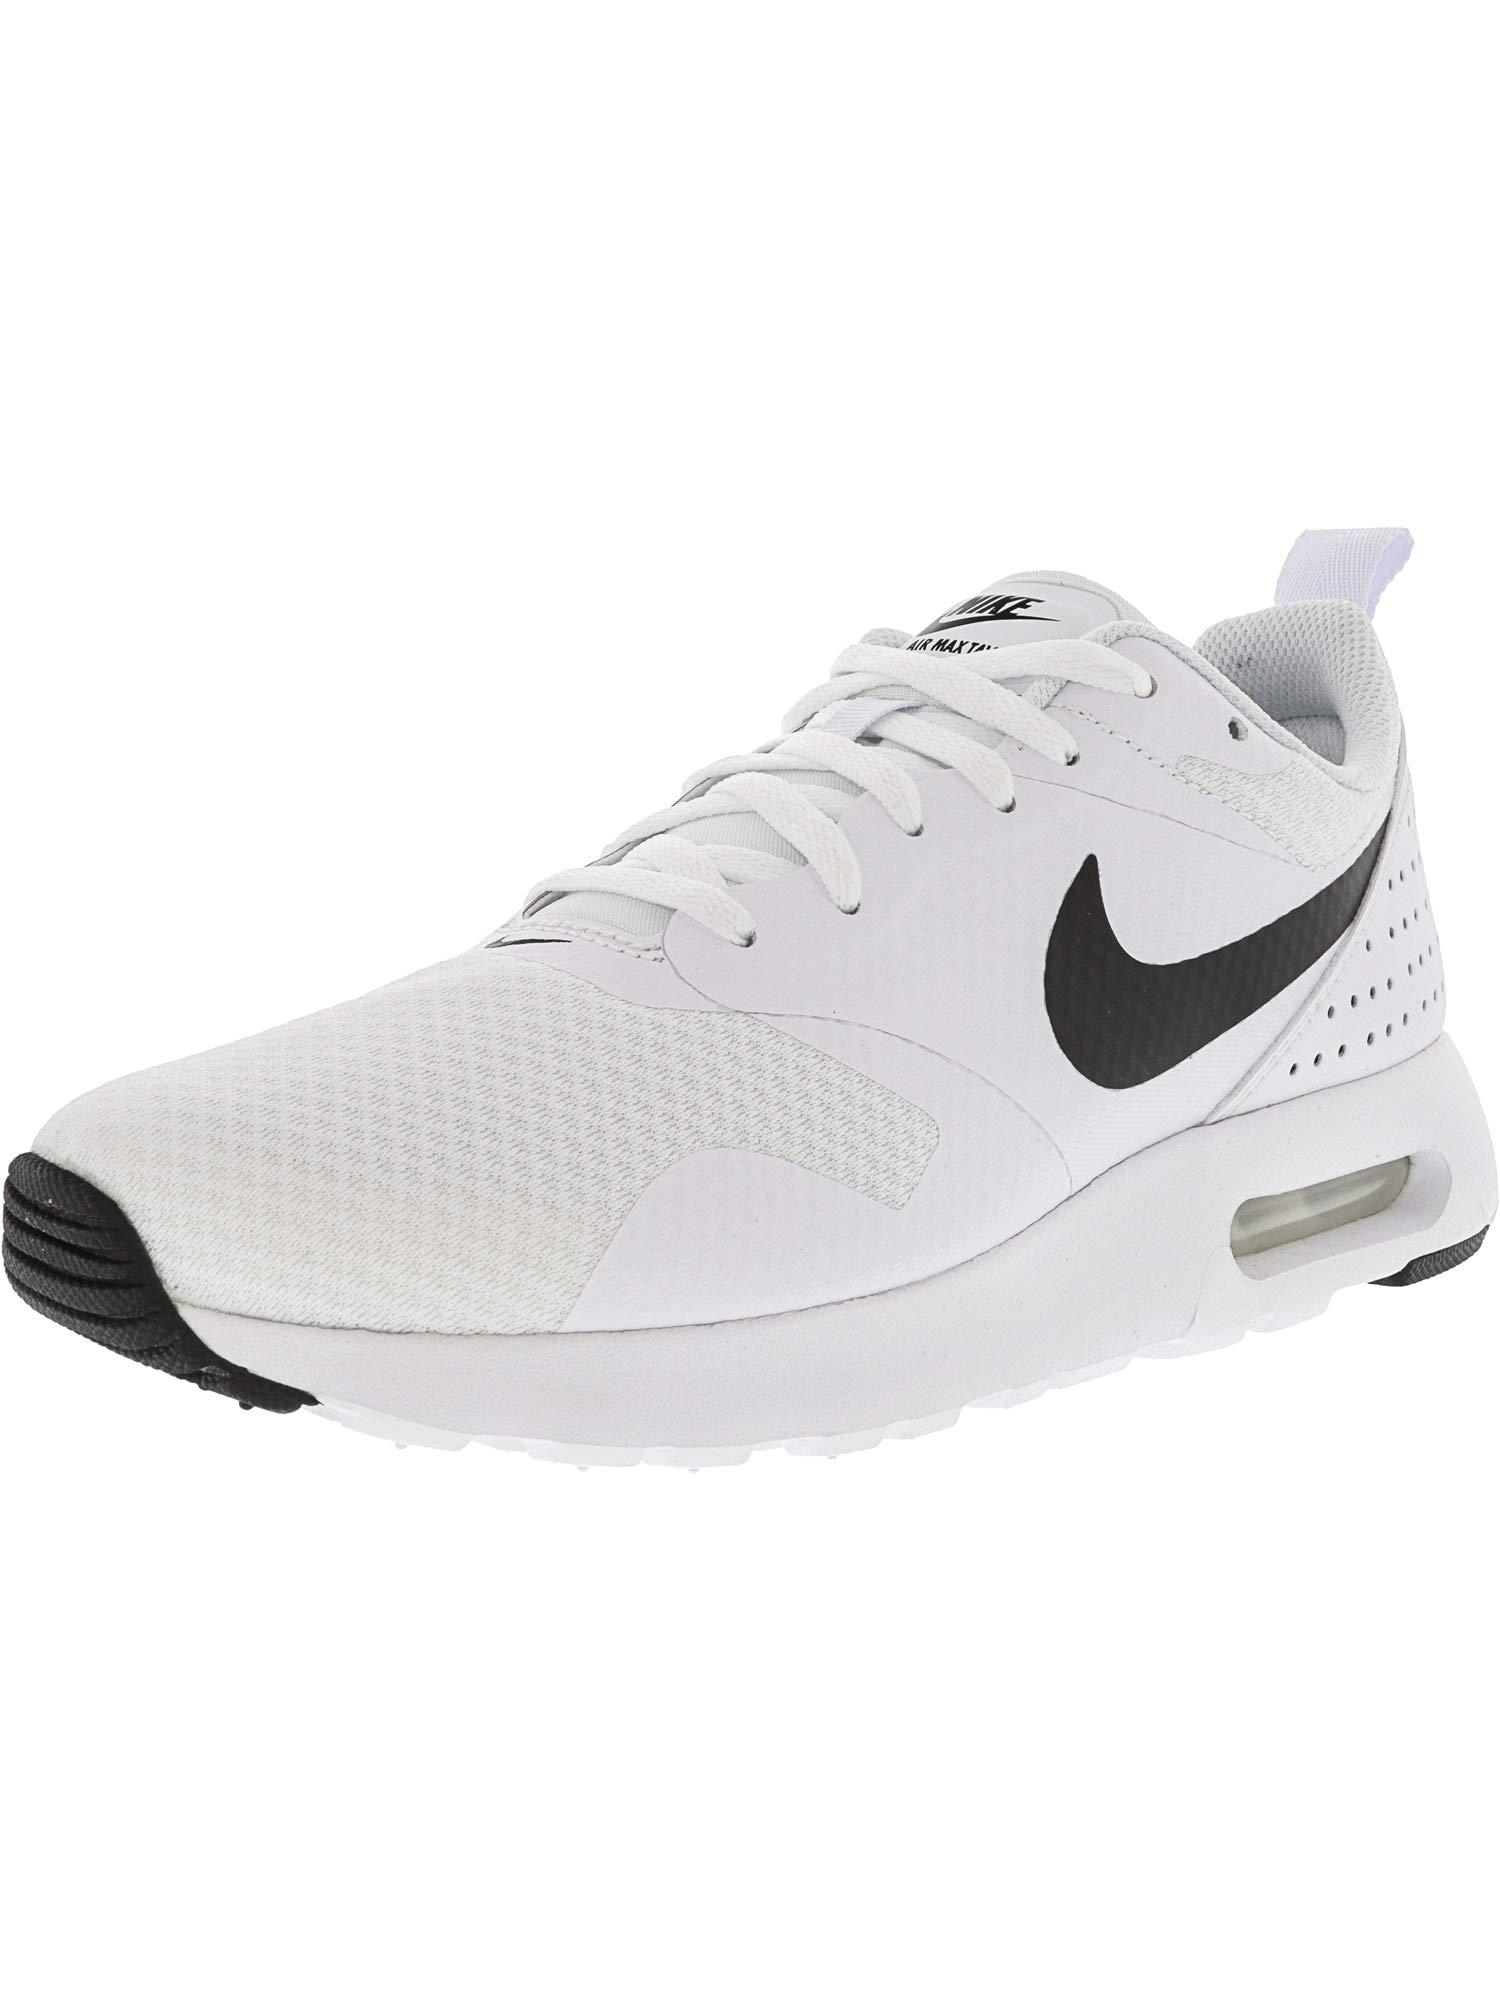 Nike Air Max Tavas Br (Gs) WhiteBlack White